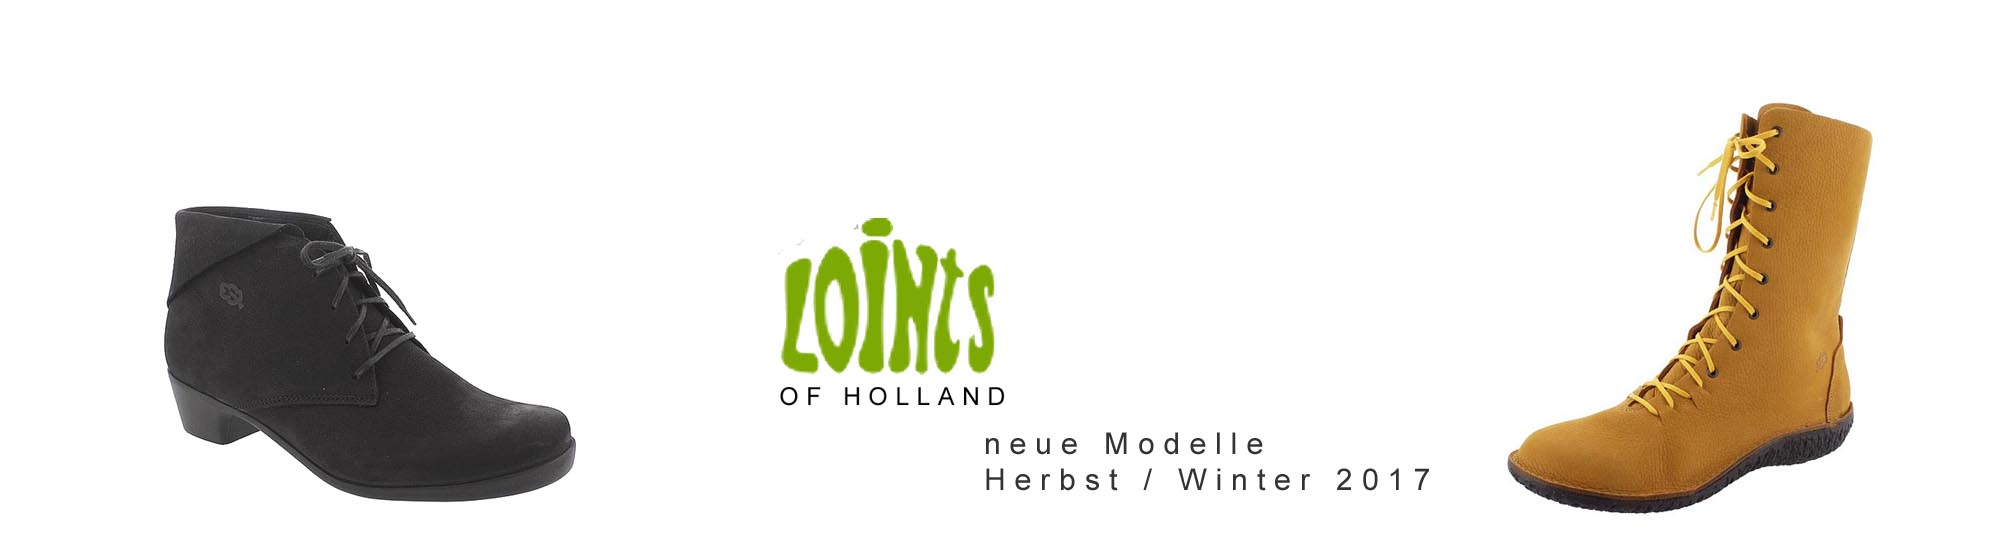 neue Loints Schuhe Herbnst Winter 2017